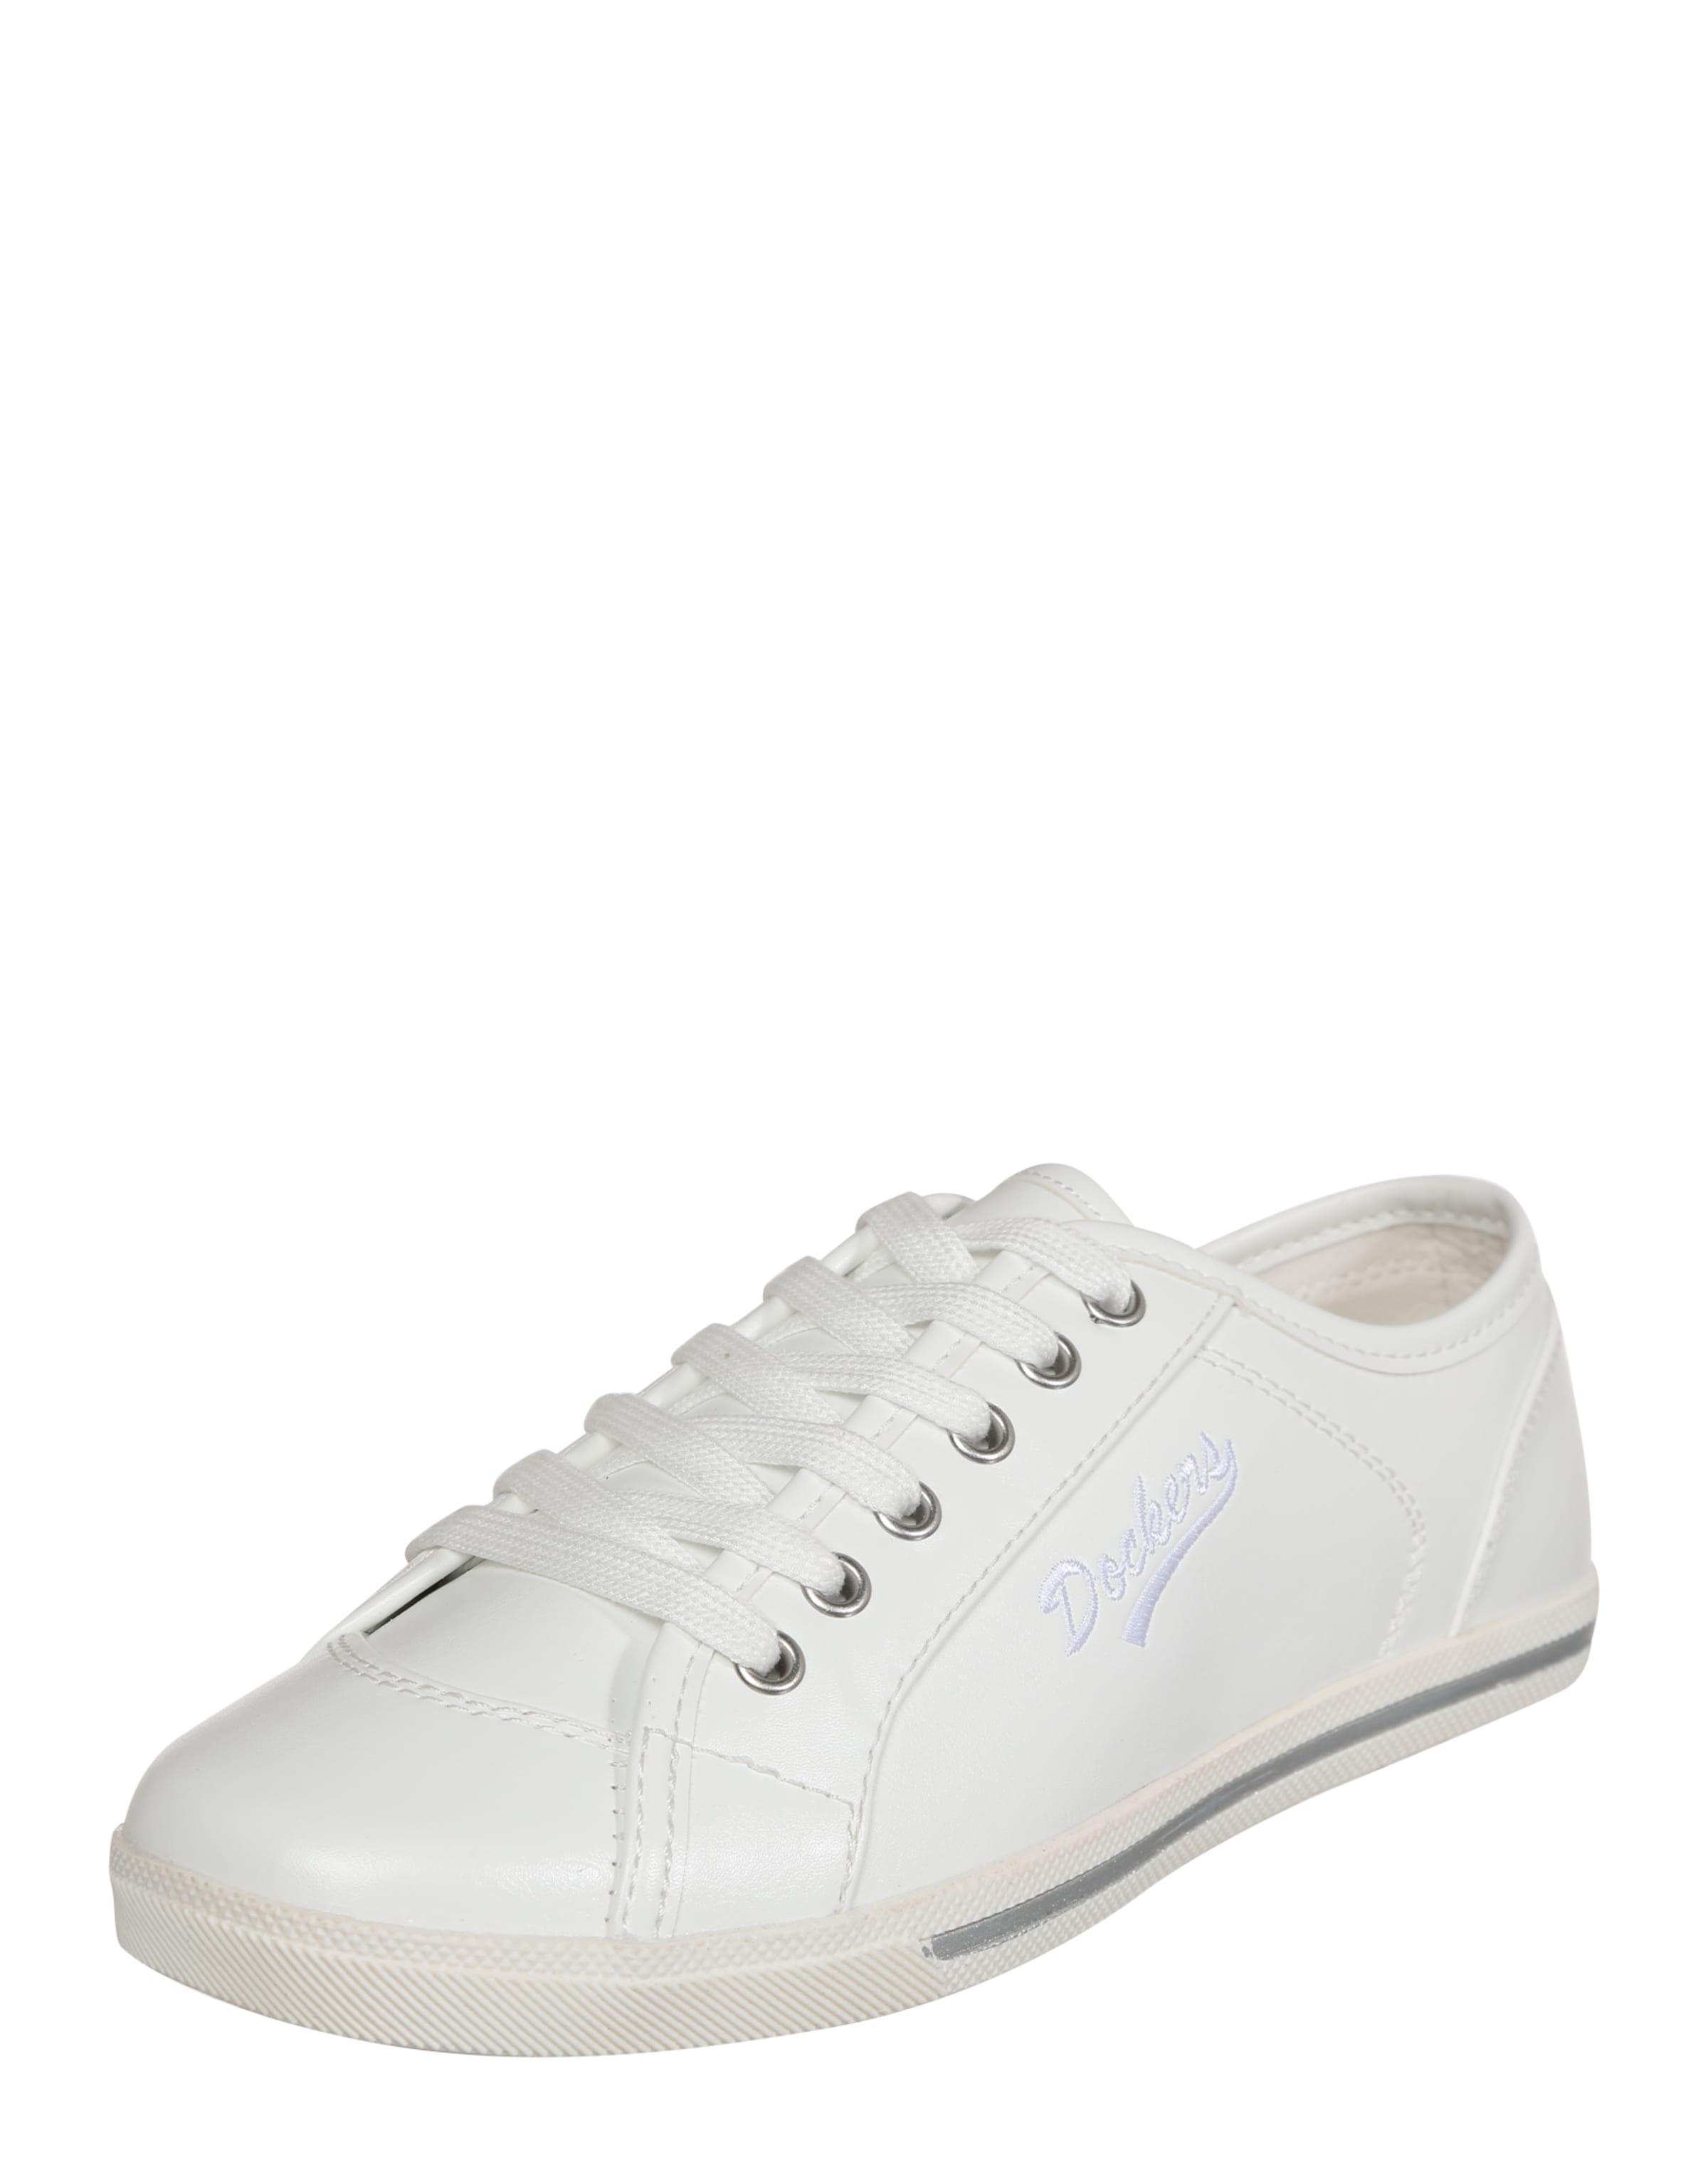 Dockers By Gerli Sneaker grau / weiß RI5fmW1GZ